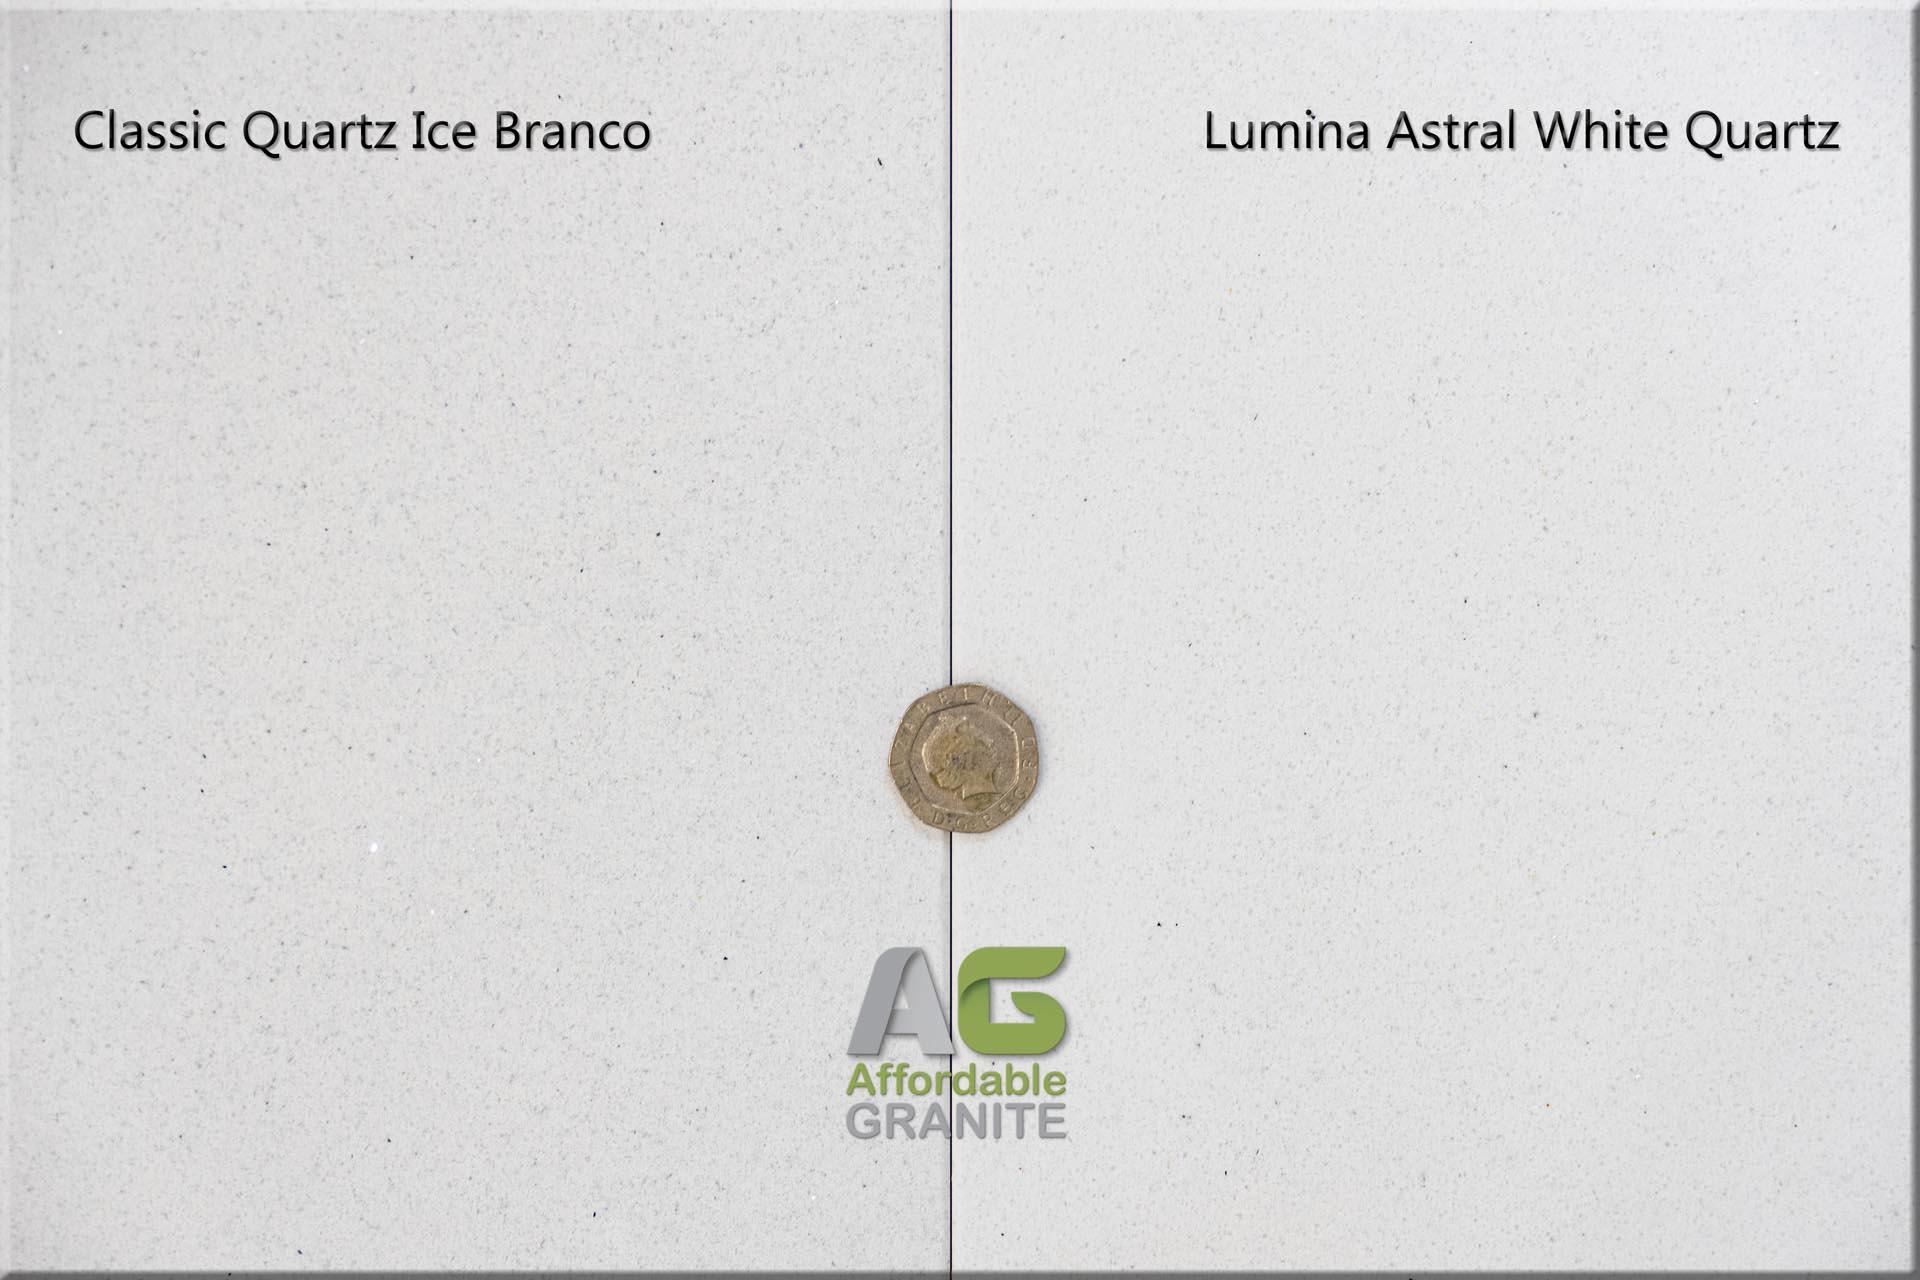 Lumina Astral White Classic Quartz Ice Branco 161727 a red